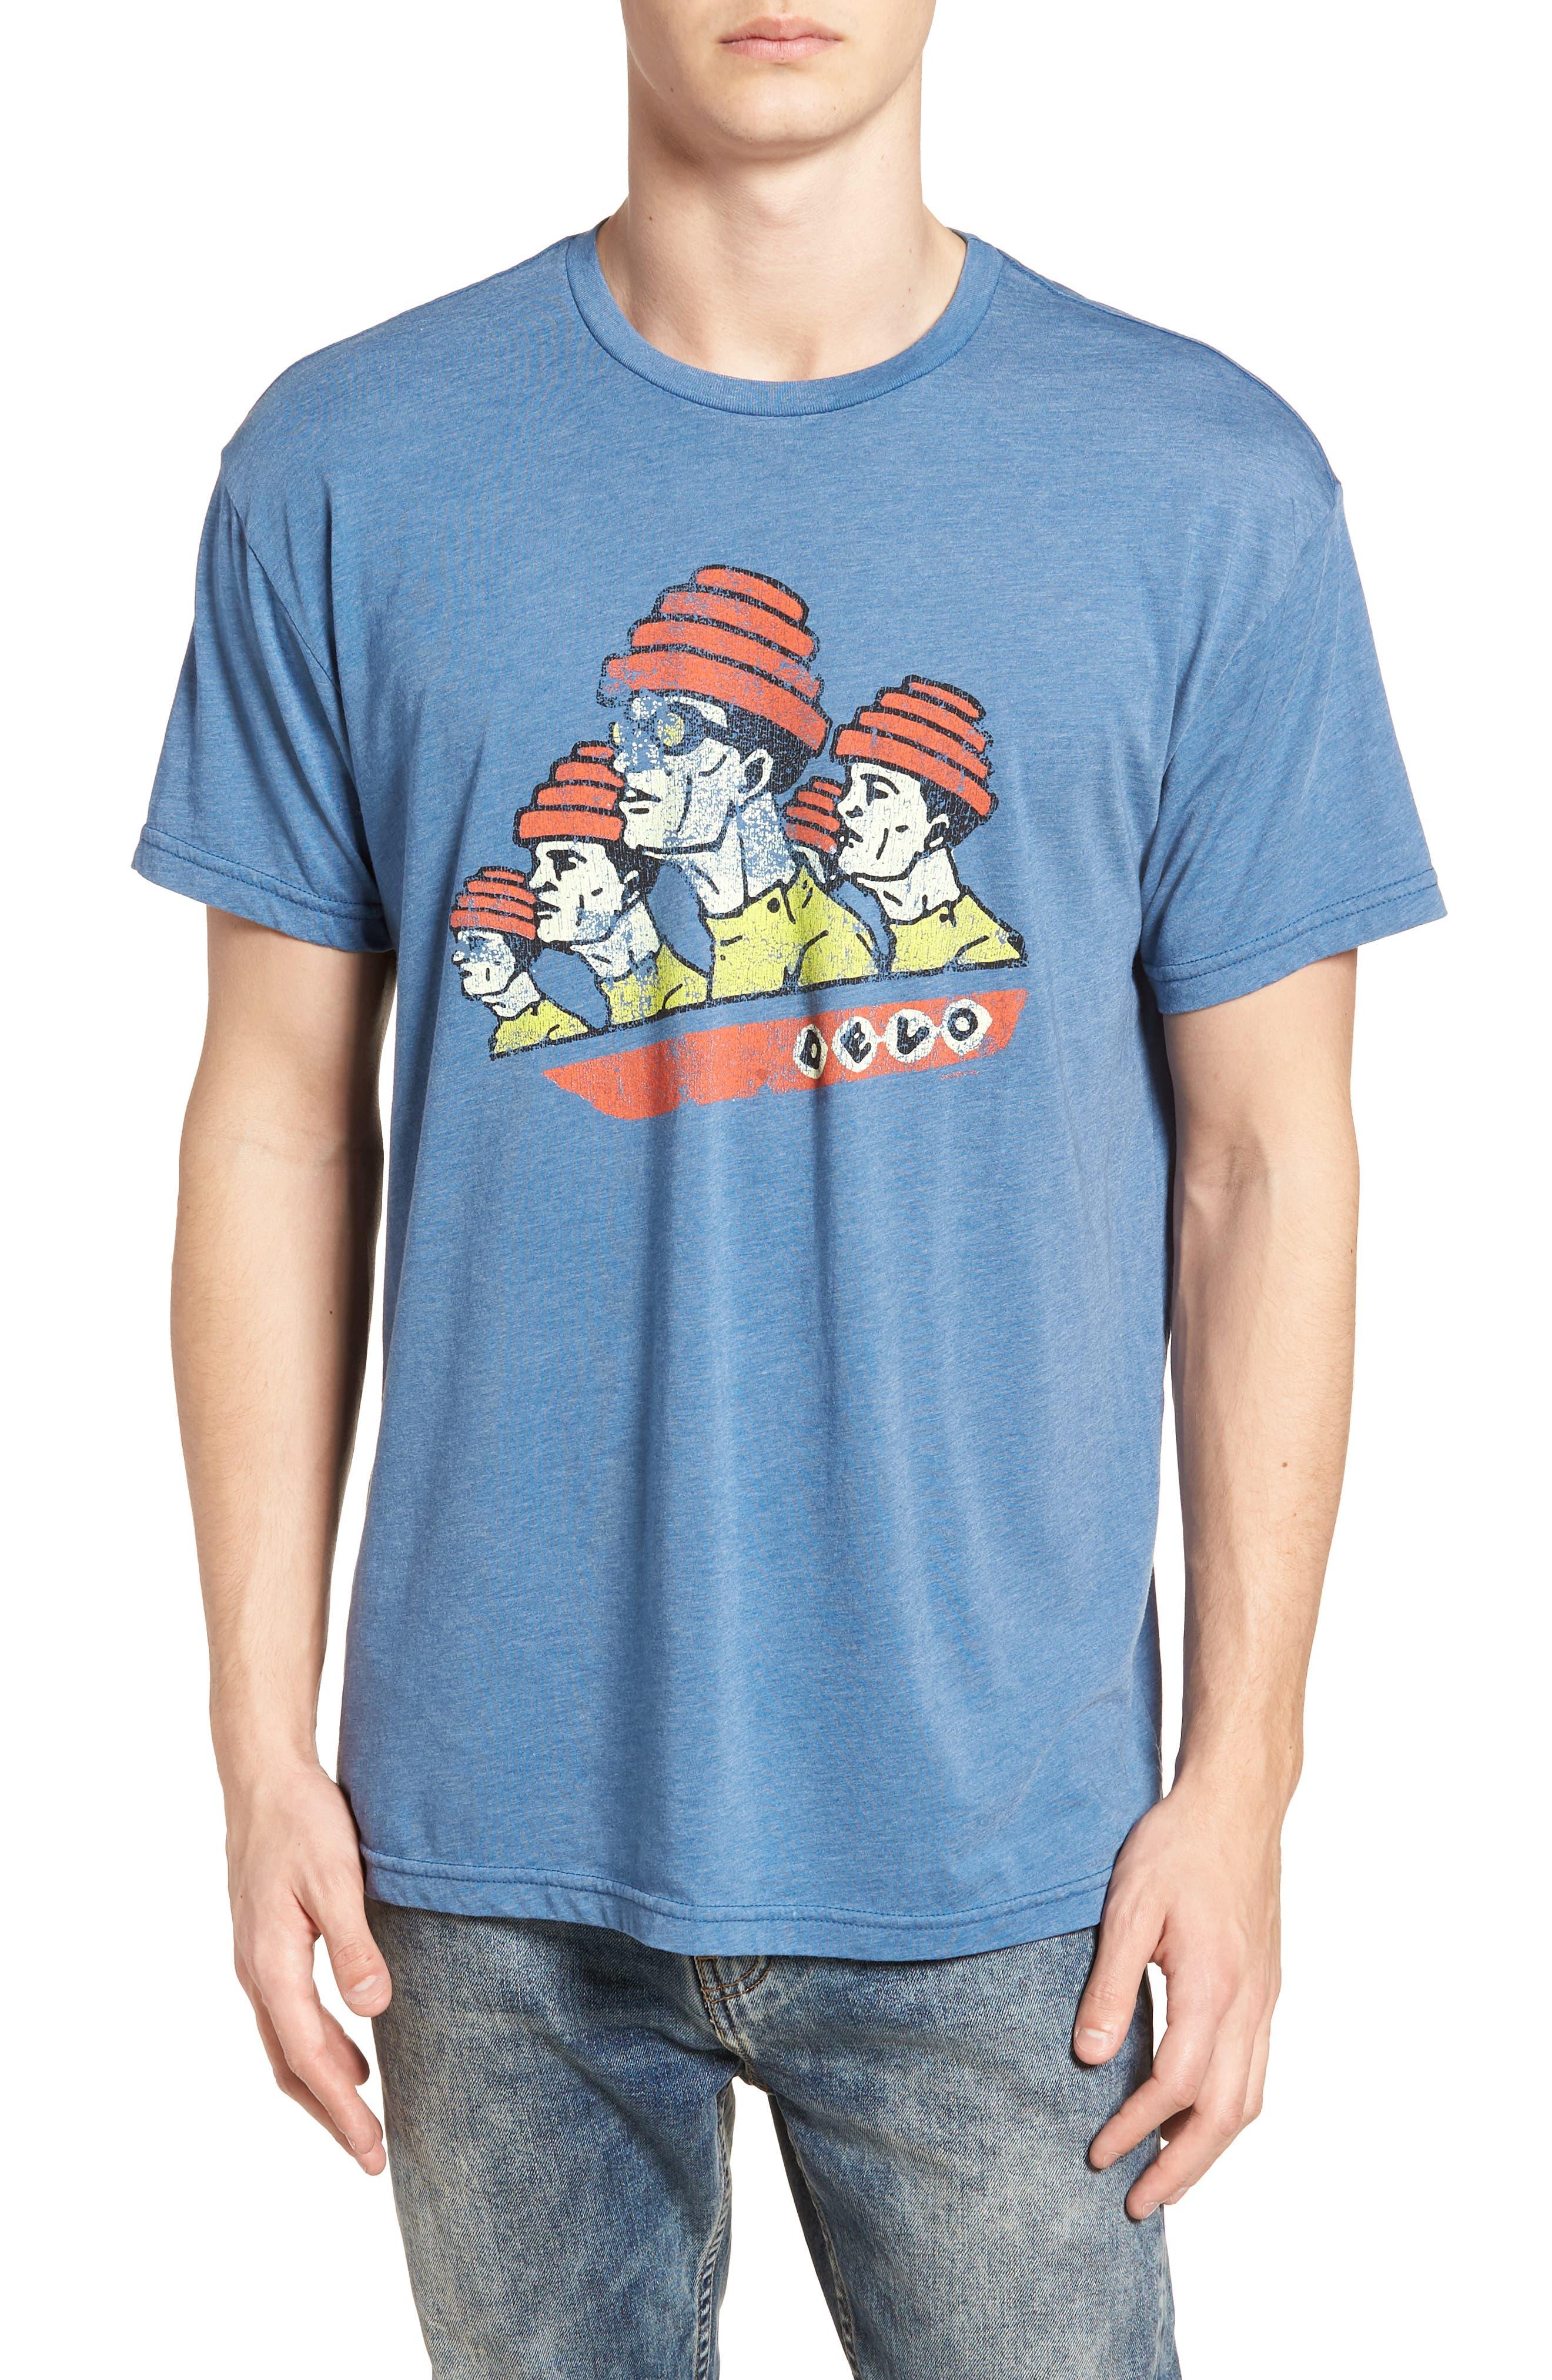 Devo Graphic T-Shirt,                         Main,                         color, 400